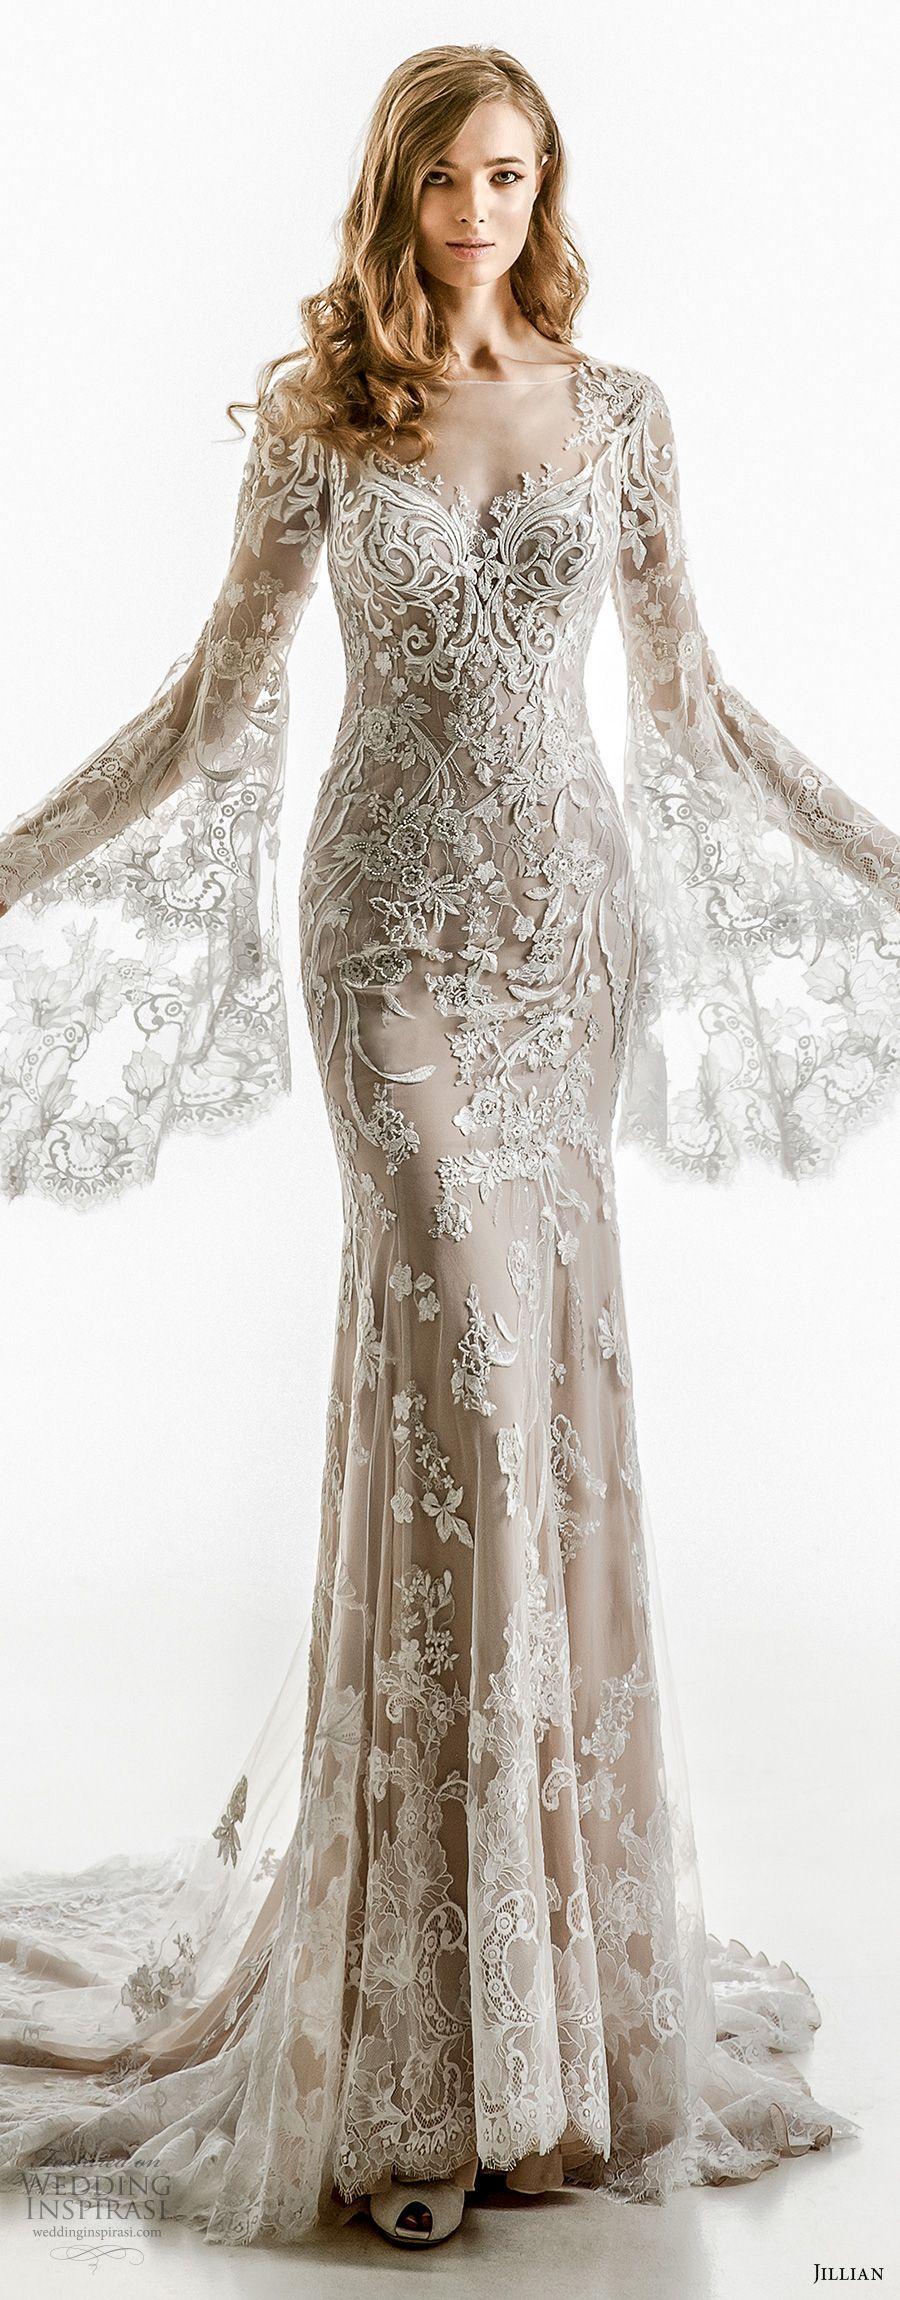 Jillian wedding dresses a little girlus fantasy pinterest